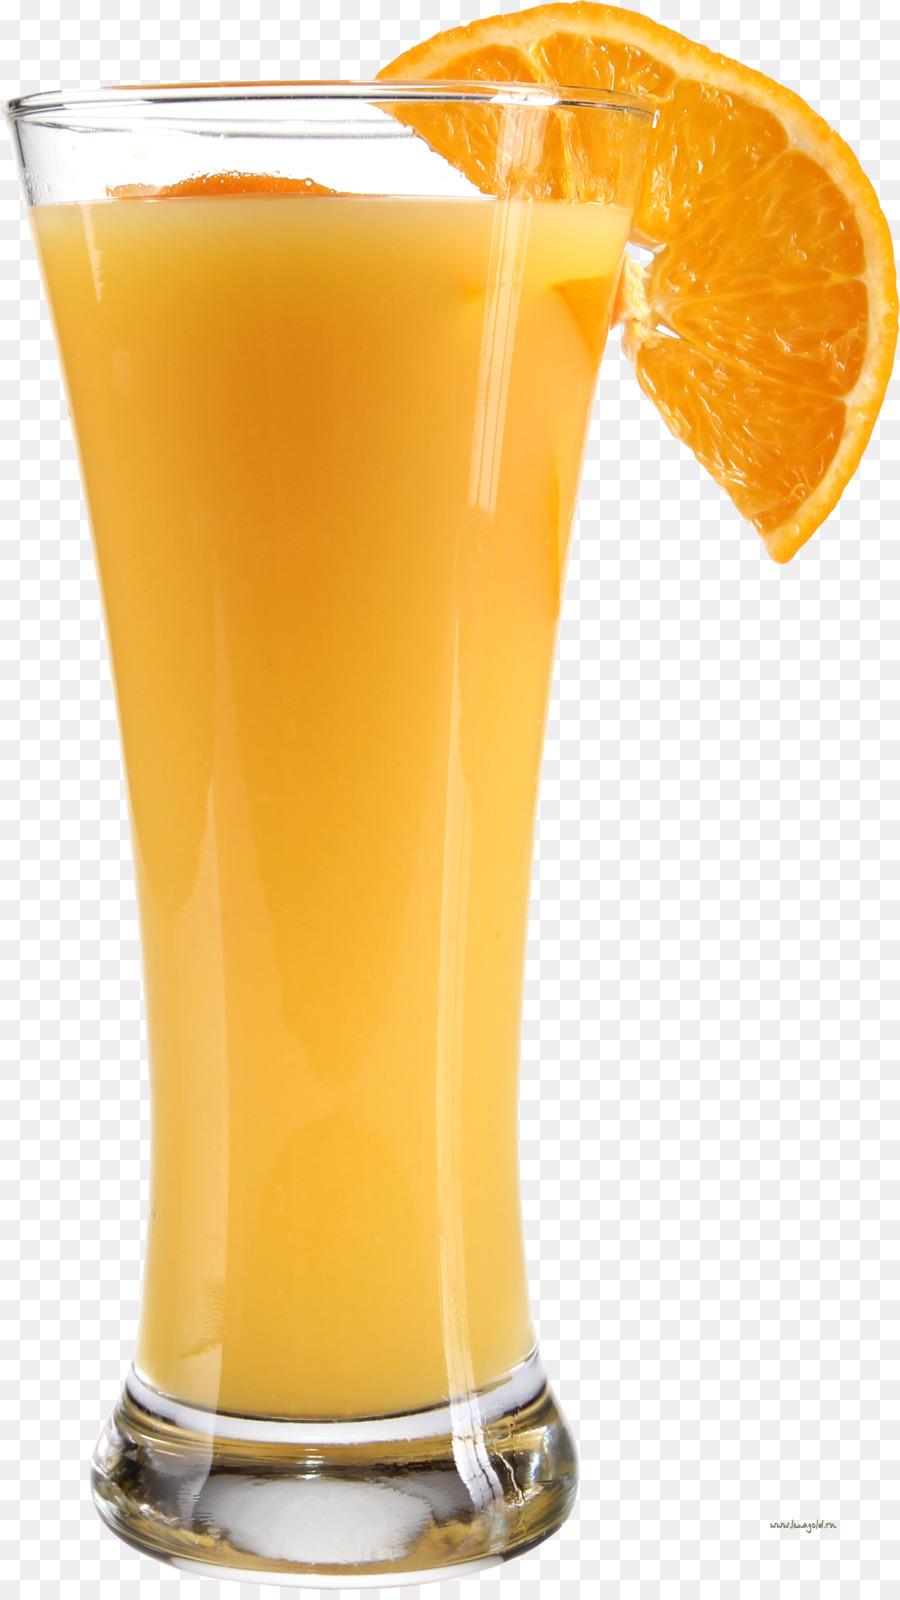 Orangensaft Apfelsaft - Punsch png herunterladen - 2871*5071 ...